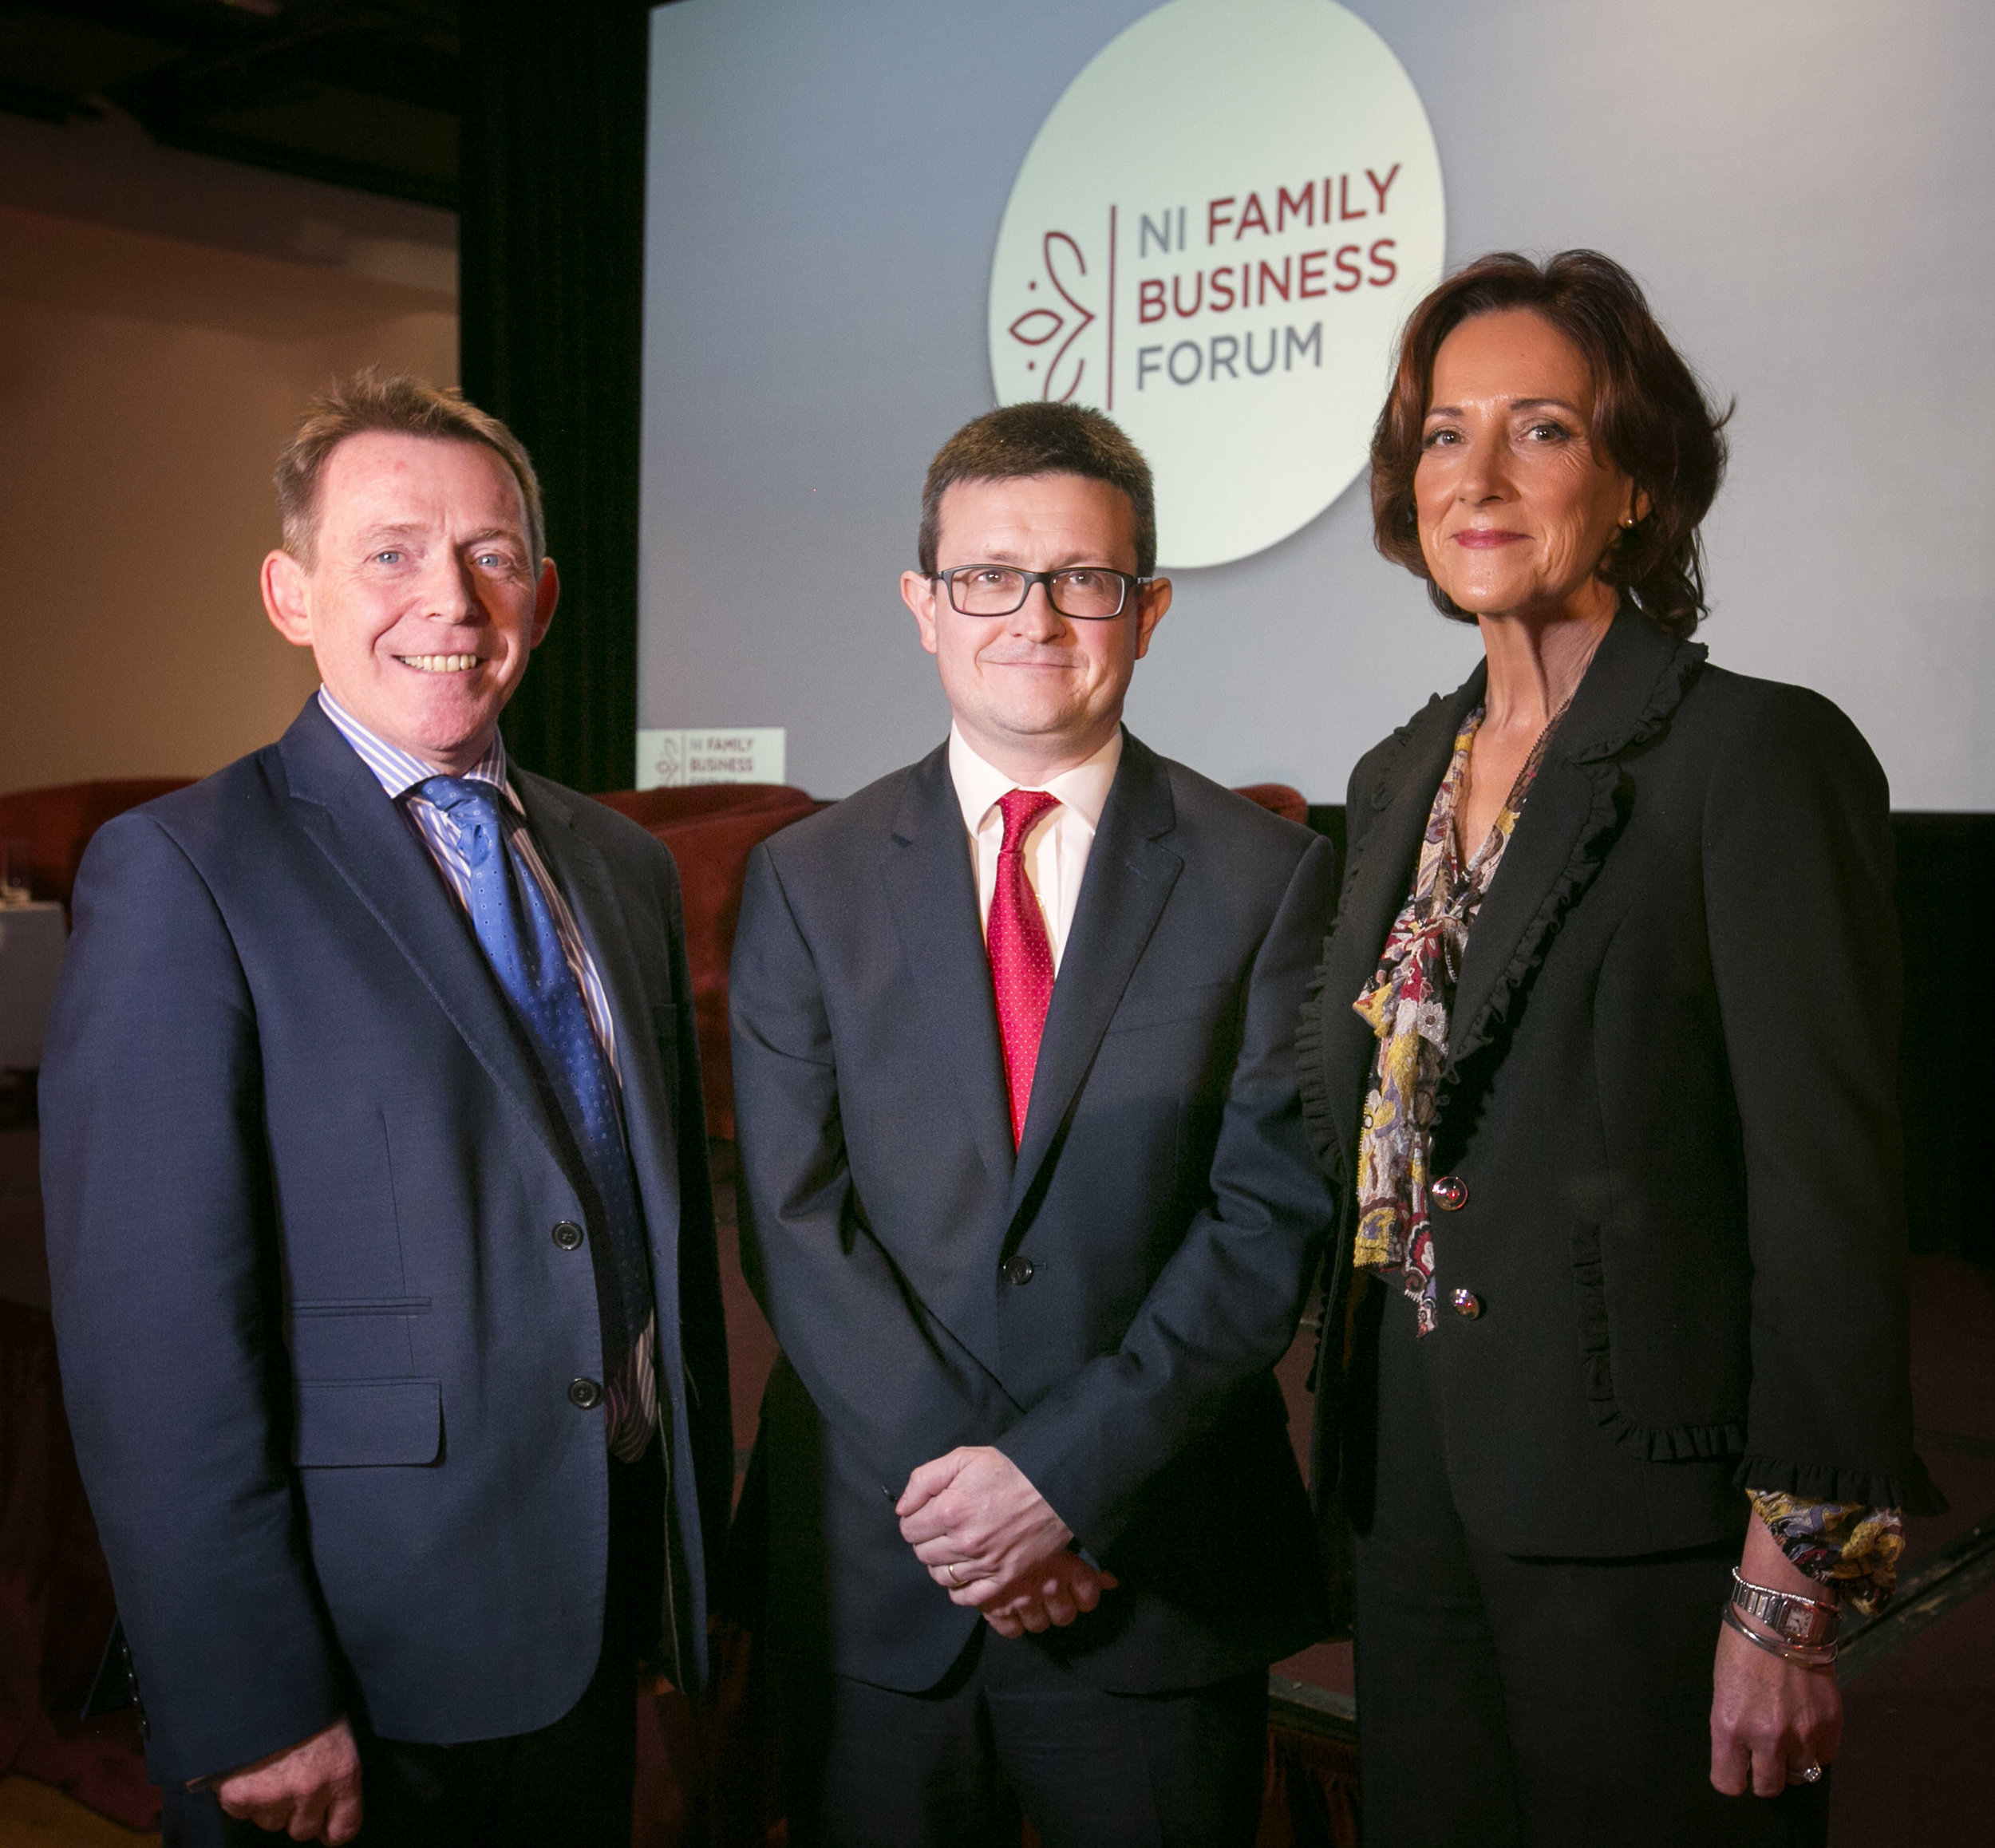 NI Family Bus Forum Pic Michael McQuillan Darren McDowell Vicki O'Toole Nov 2017.jpg